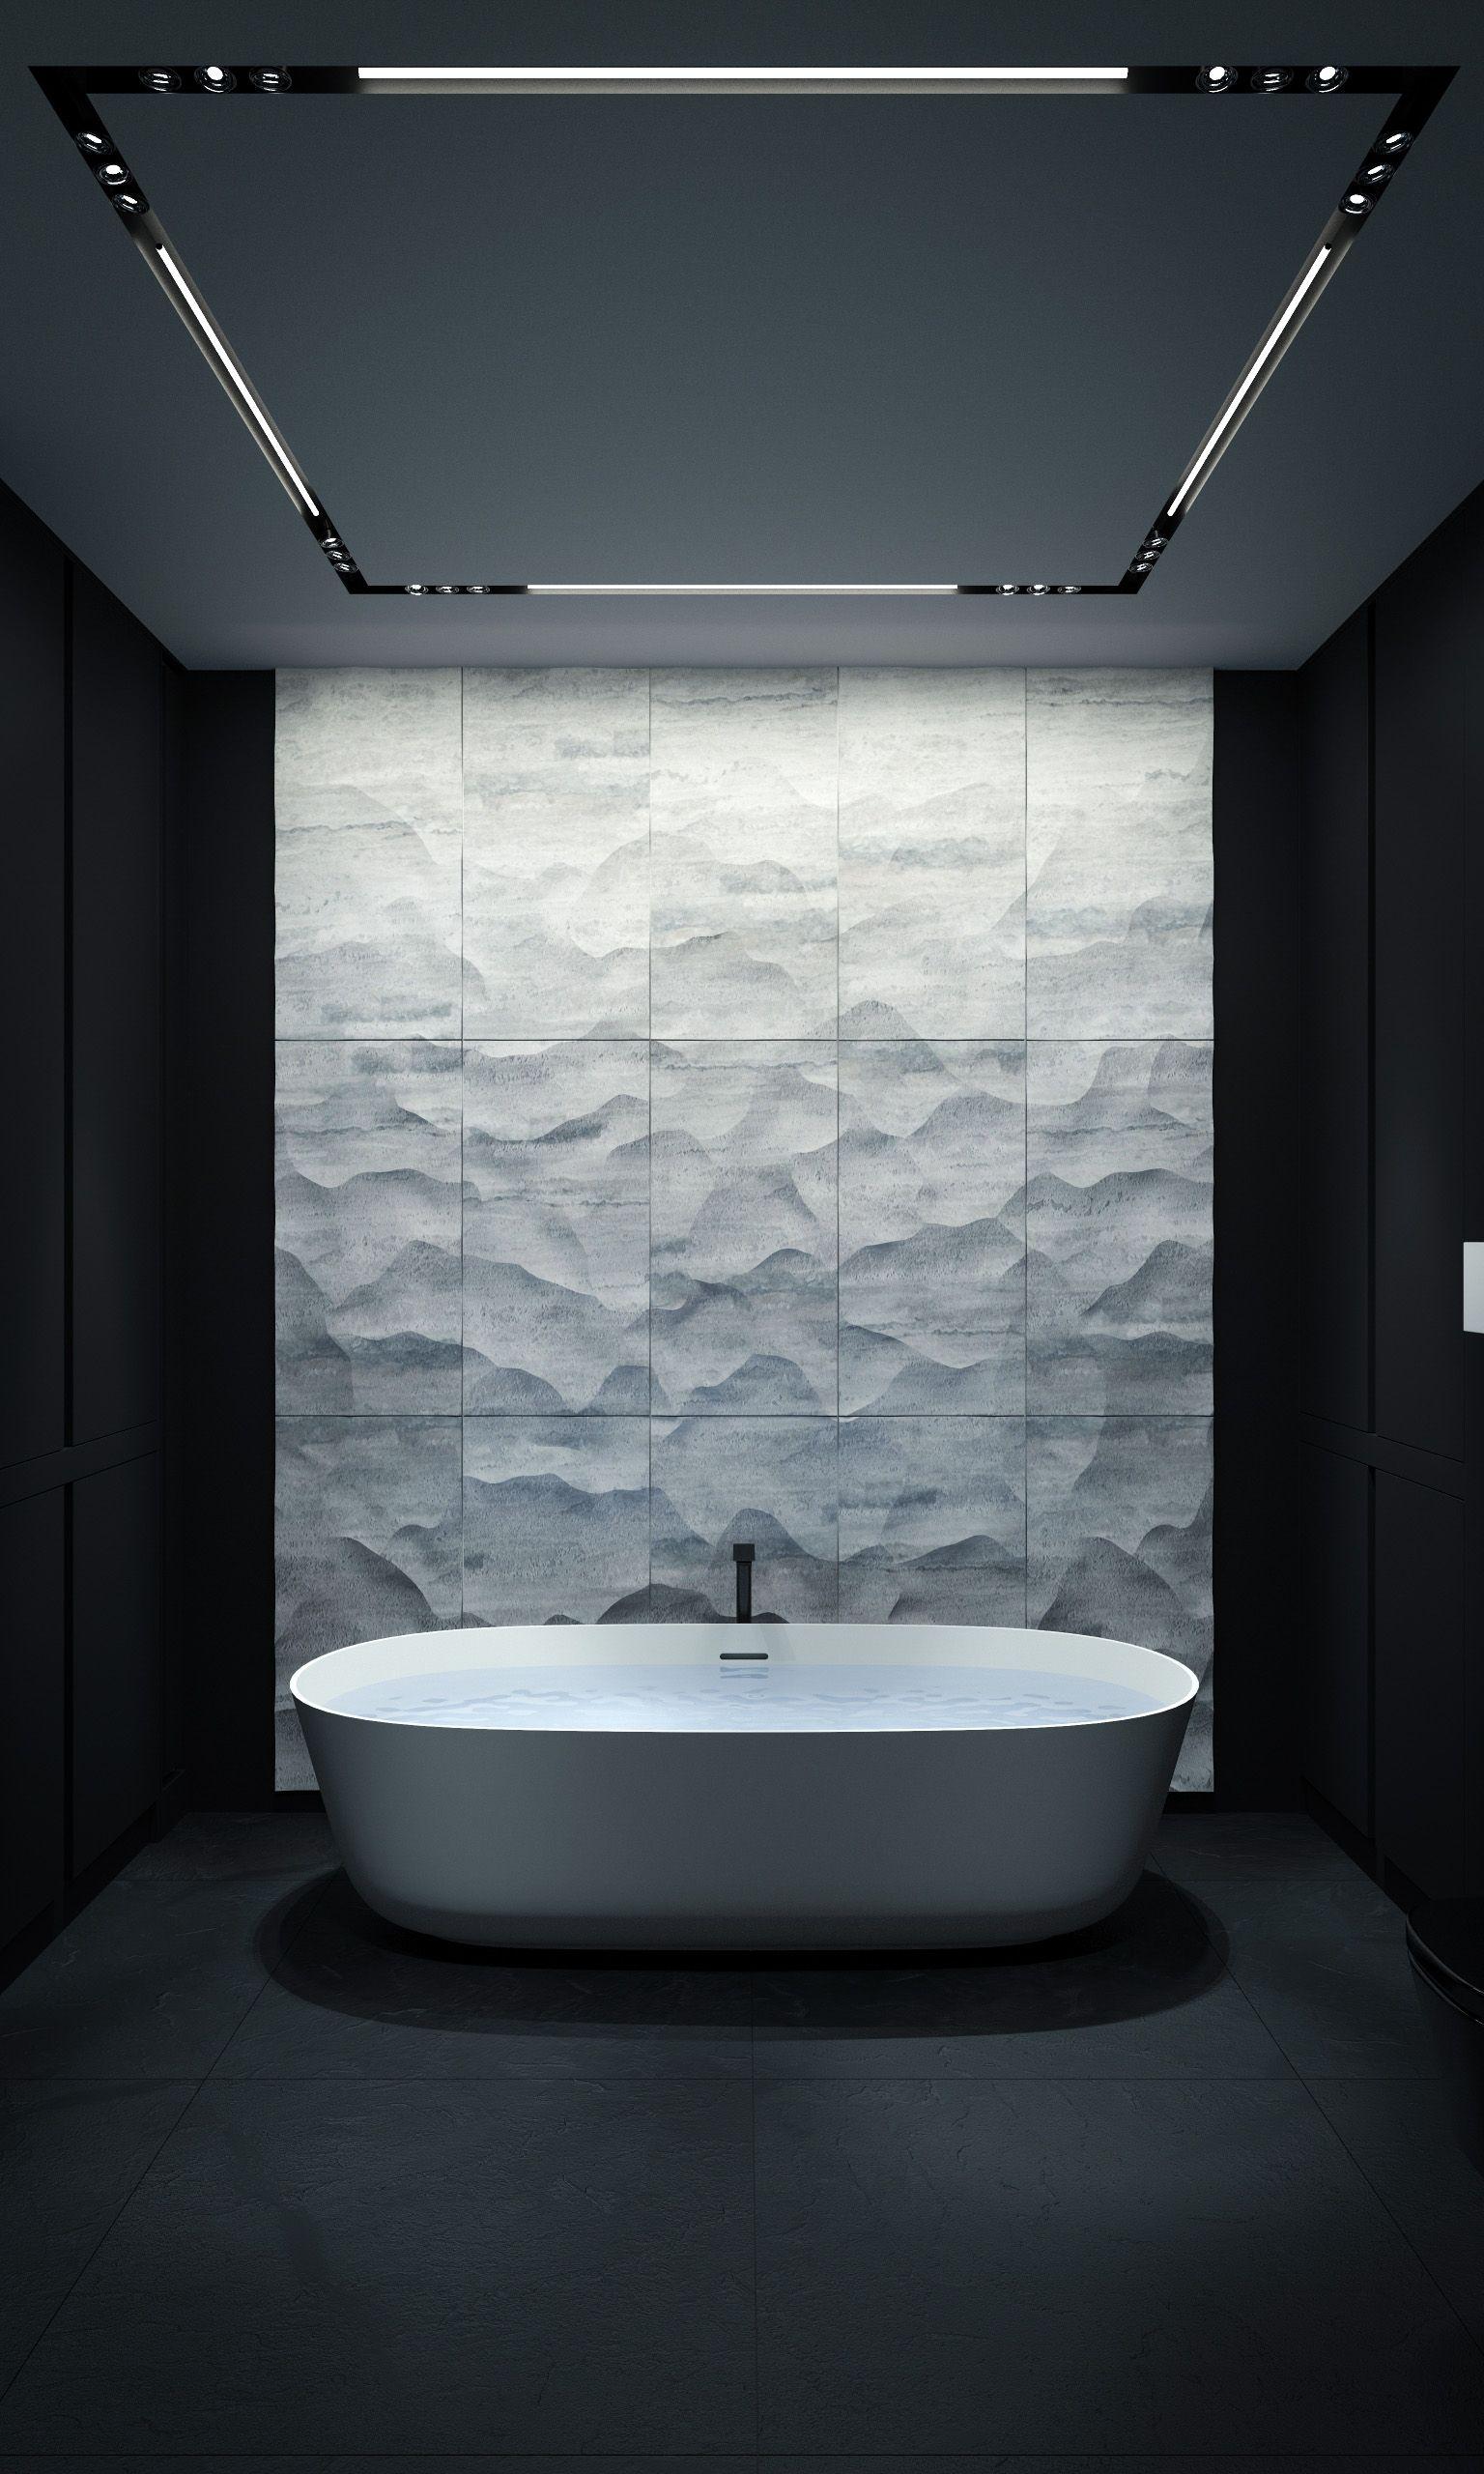 Minimalist Masculine Bathroom In Black And White BATHROOM | KERZMAN #marble  #minimalist #shadows